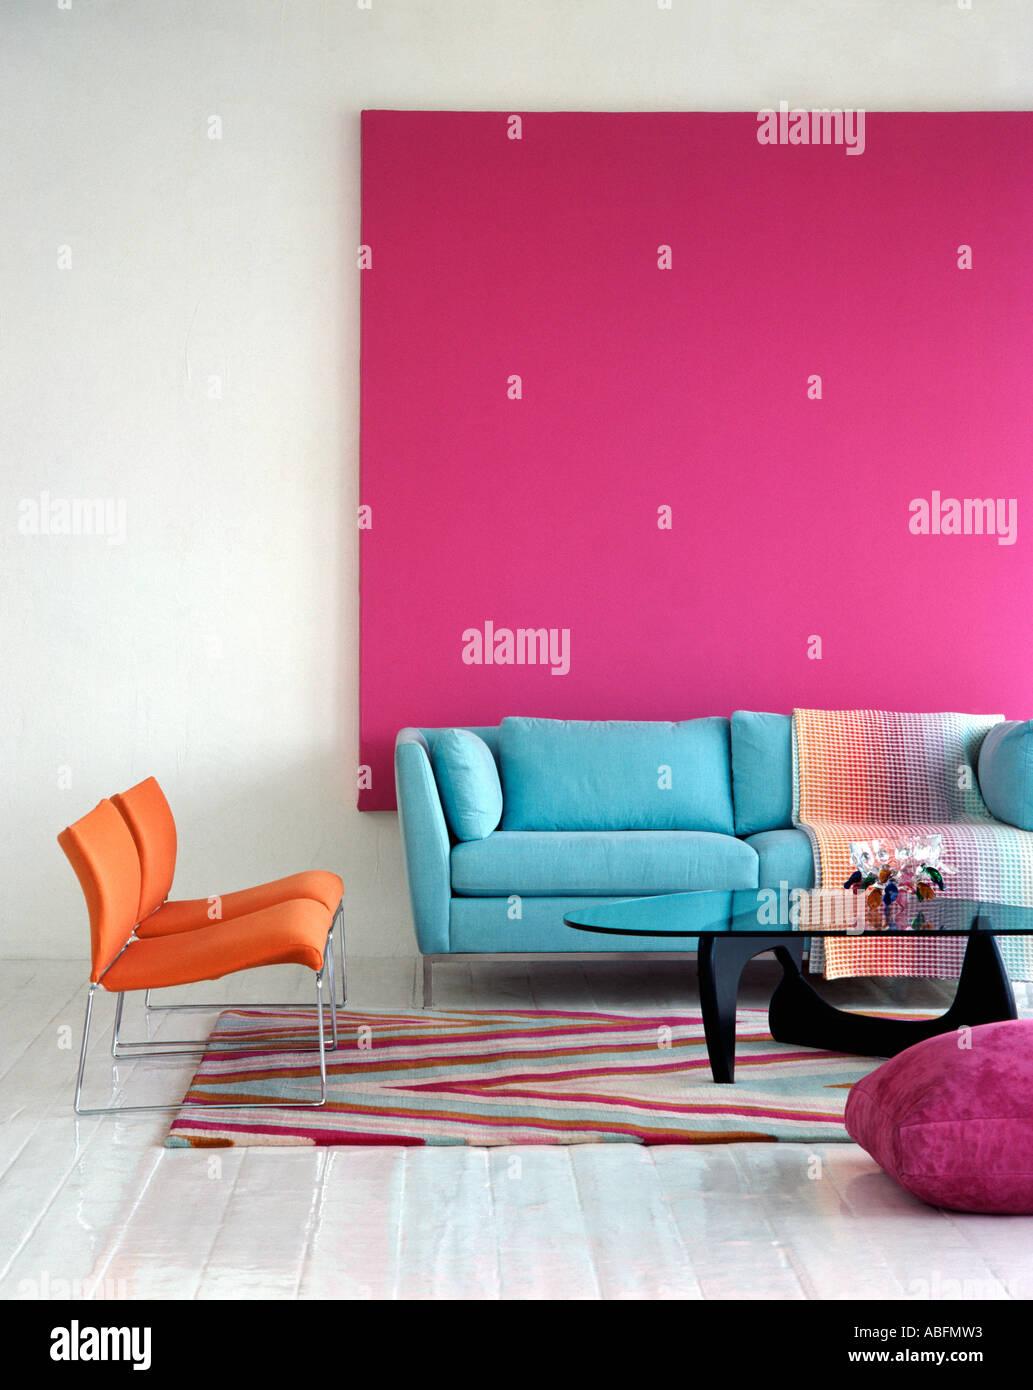 interiors livingrooms modern town stock photos interiors rh alamy com Plywood Furniture Wood and Metal Chairs